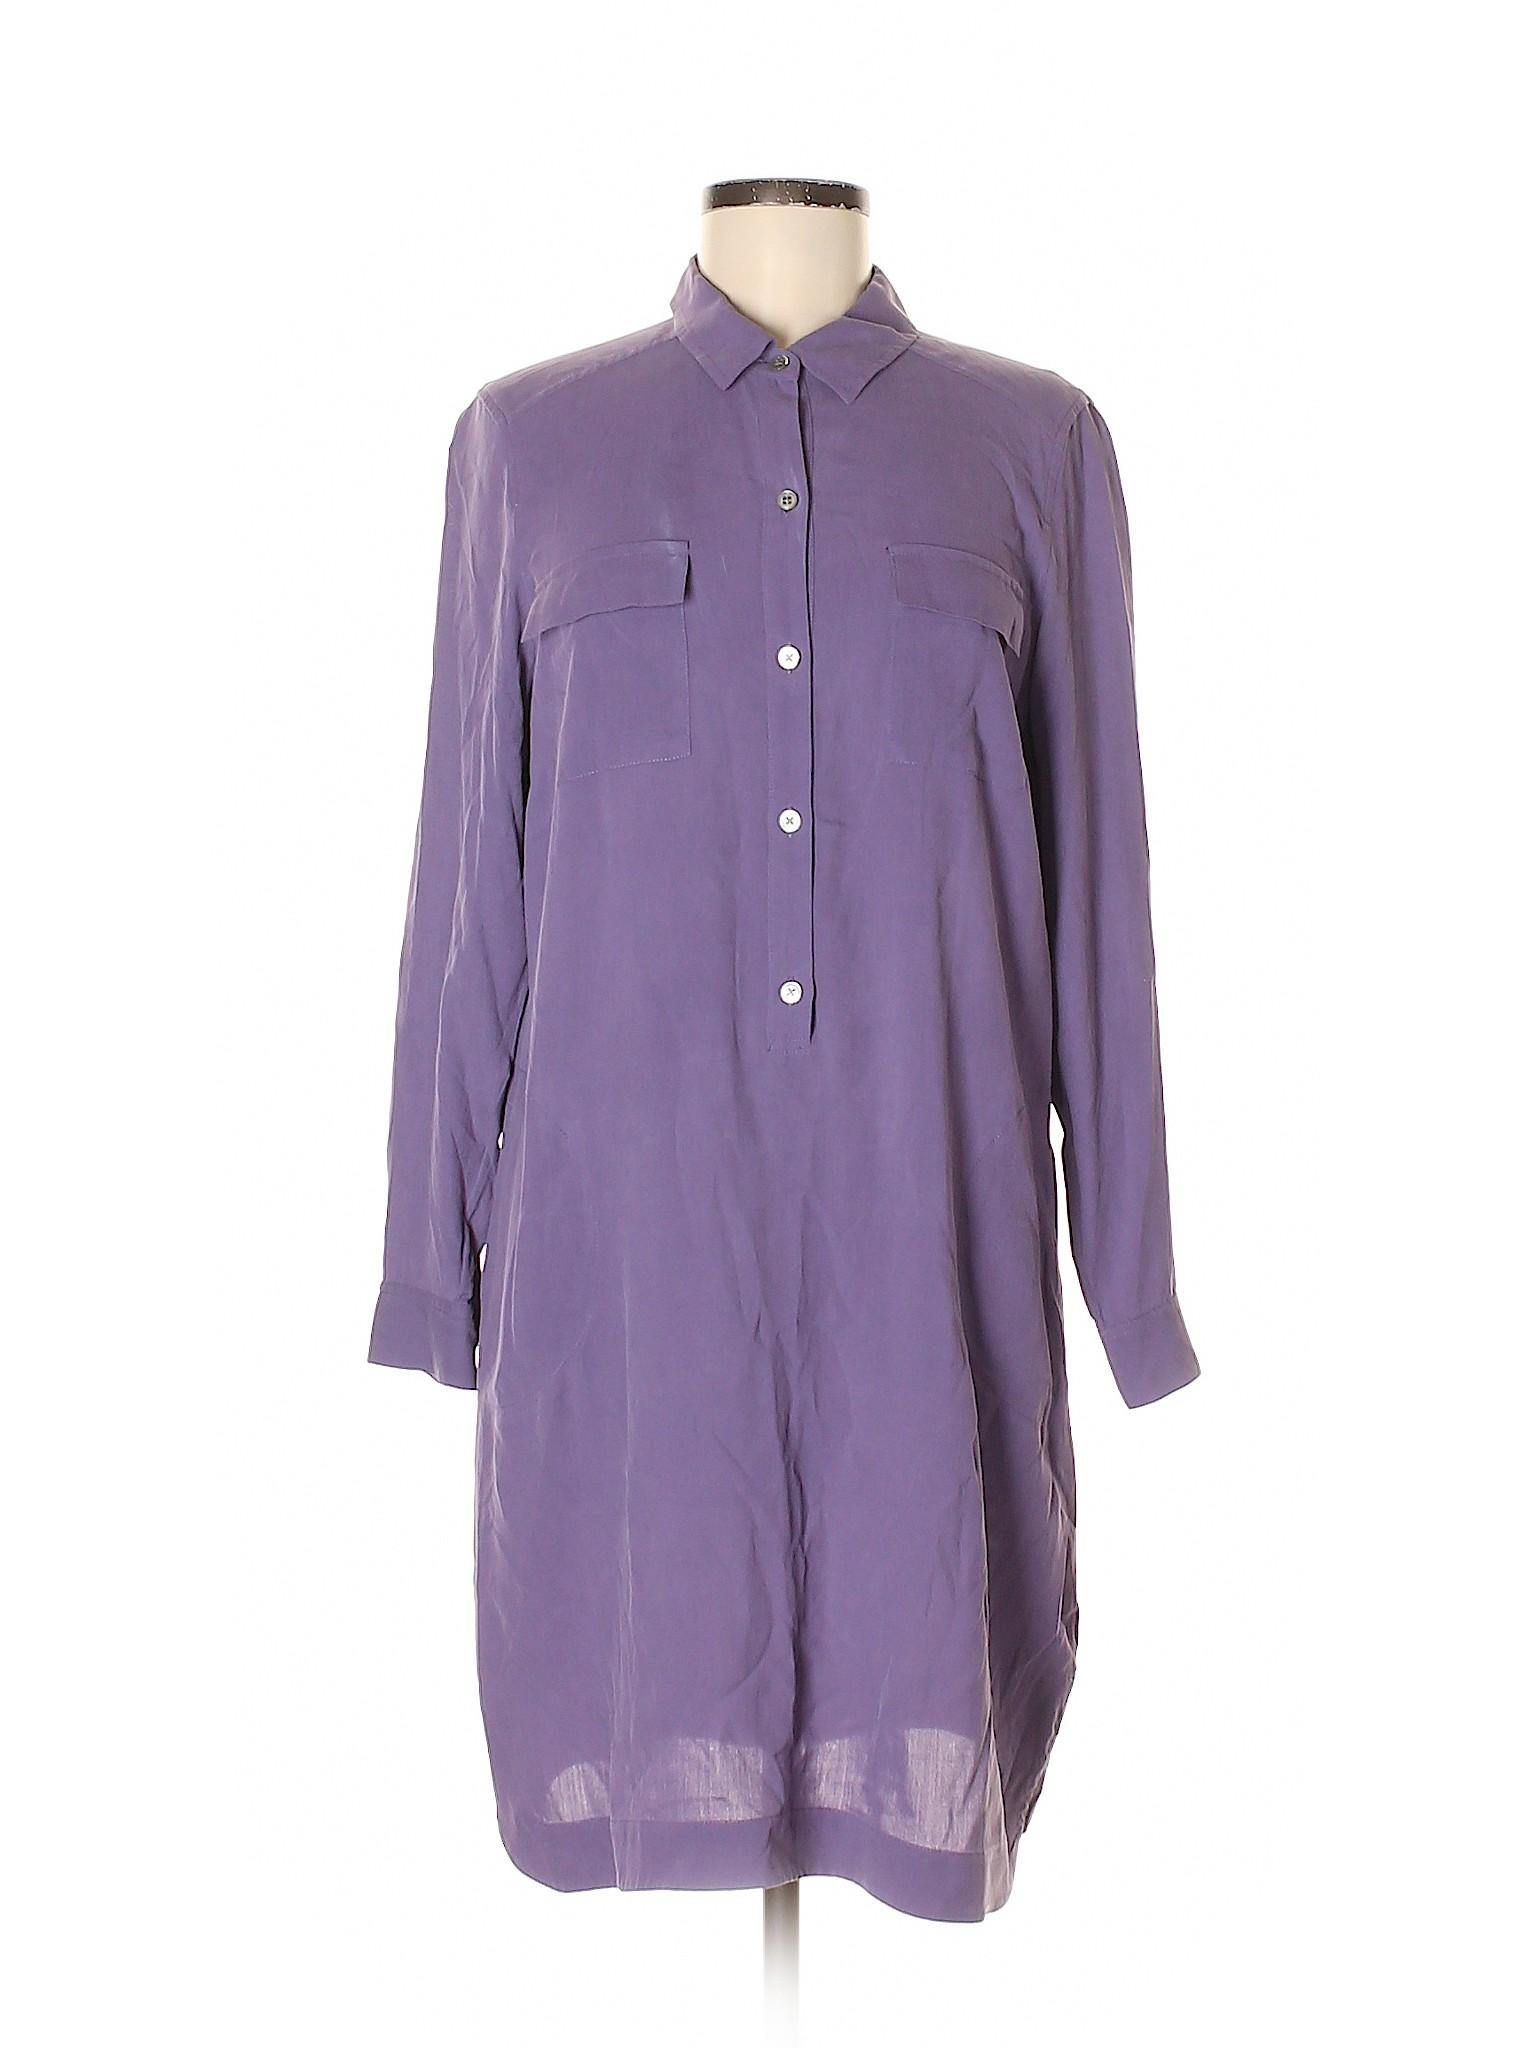 9574a2483a6cd Details about J.Jill Women Purple Casual Dress Med Petite